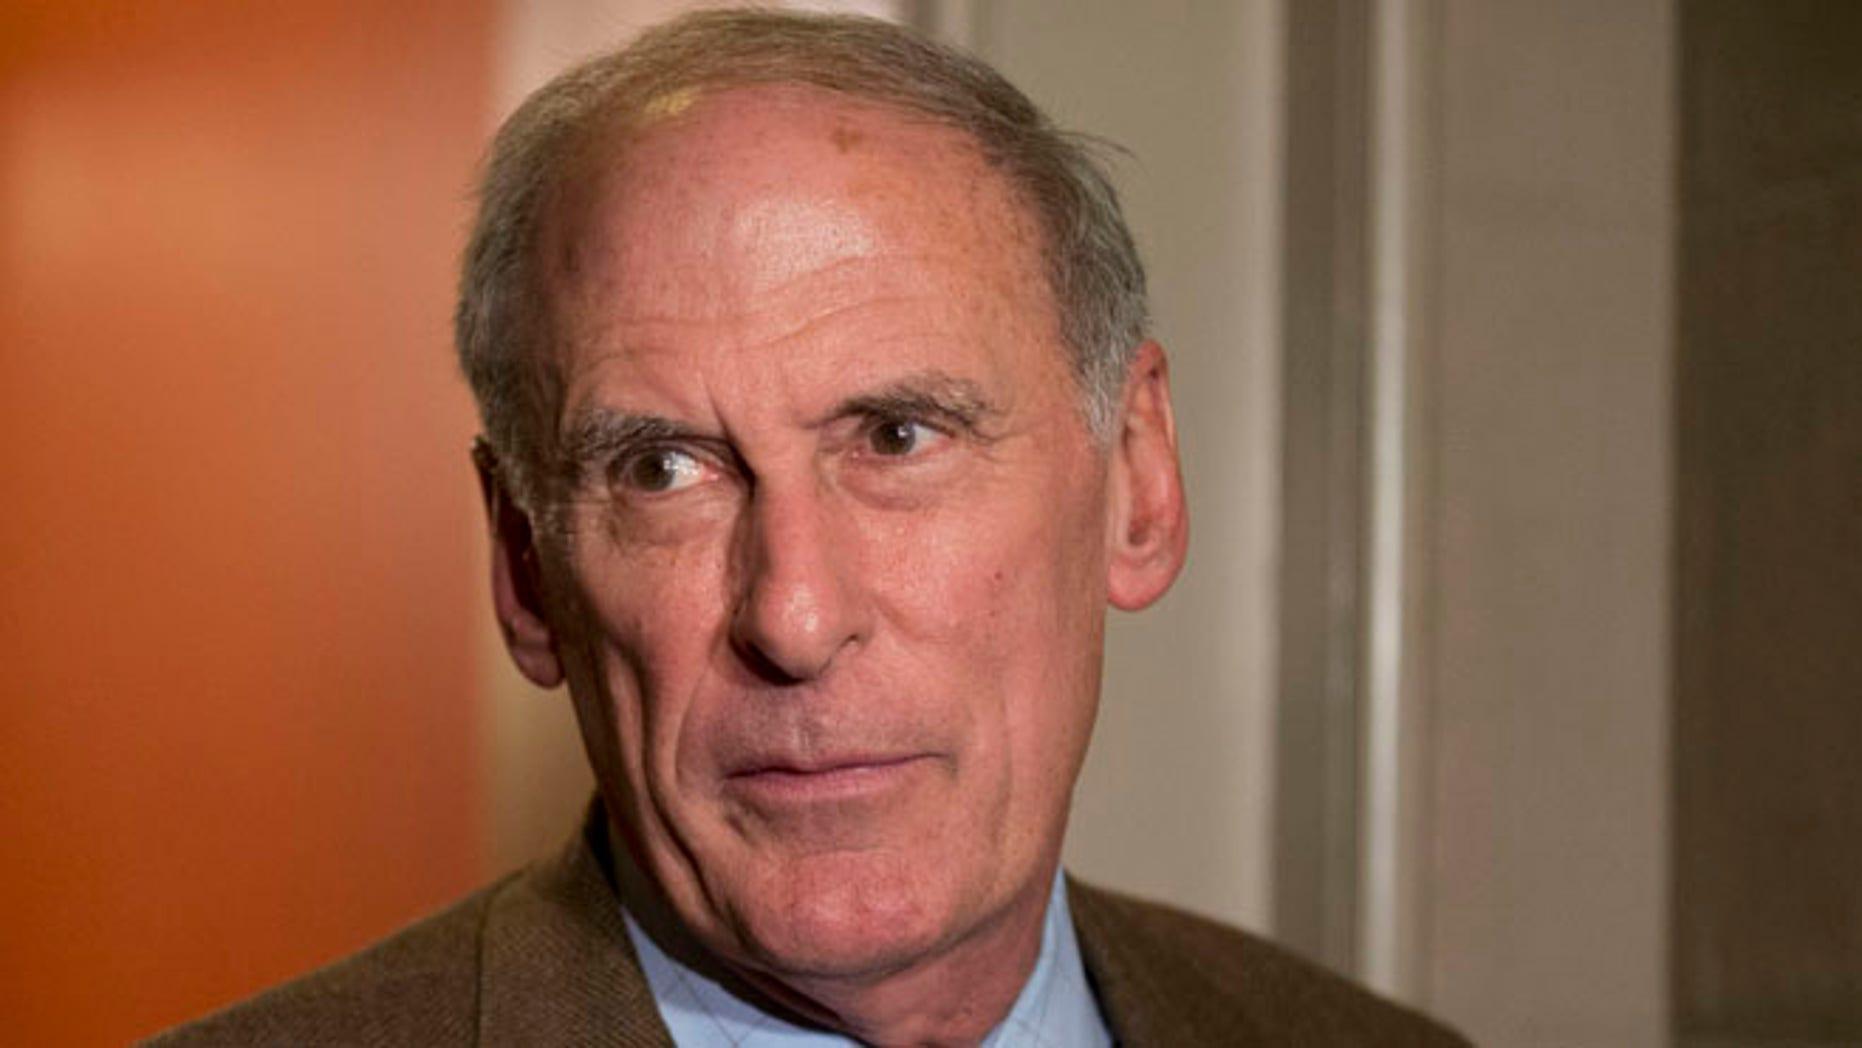 FILE: Dec. 31, 2012: Sen. Dan Coats, R-Ind., speaks on Capitol Hill in Washington, D.C.